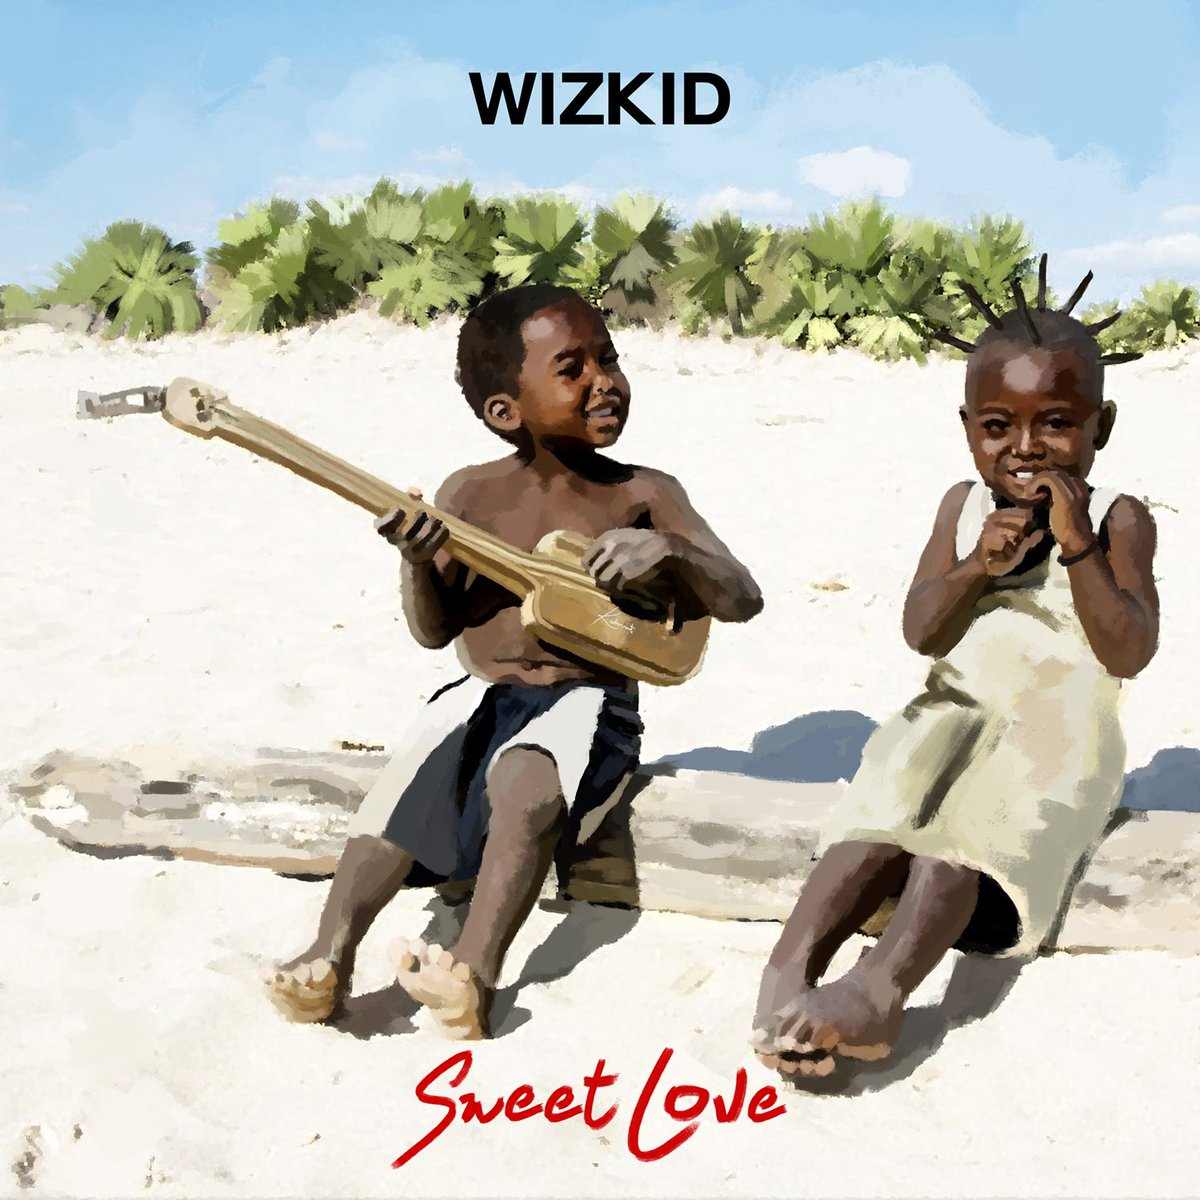 video wizkid sweet love latest naija nigerian music songs video. Black Bedroom Furniture Sets. Home Design Ideas